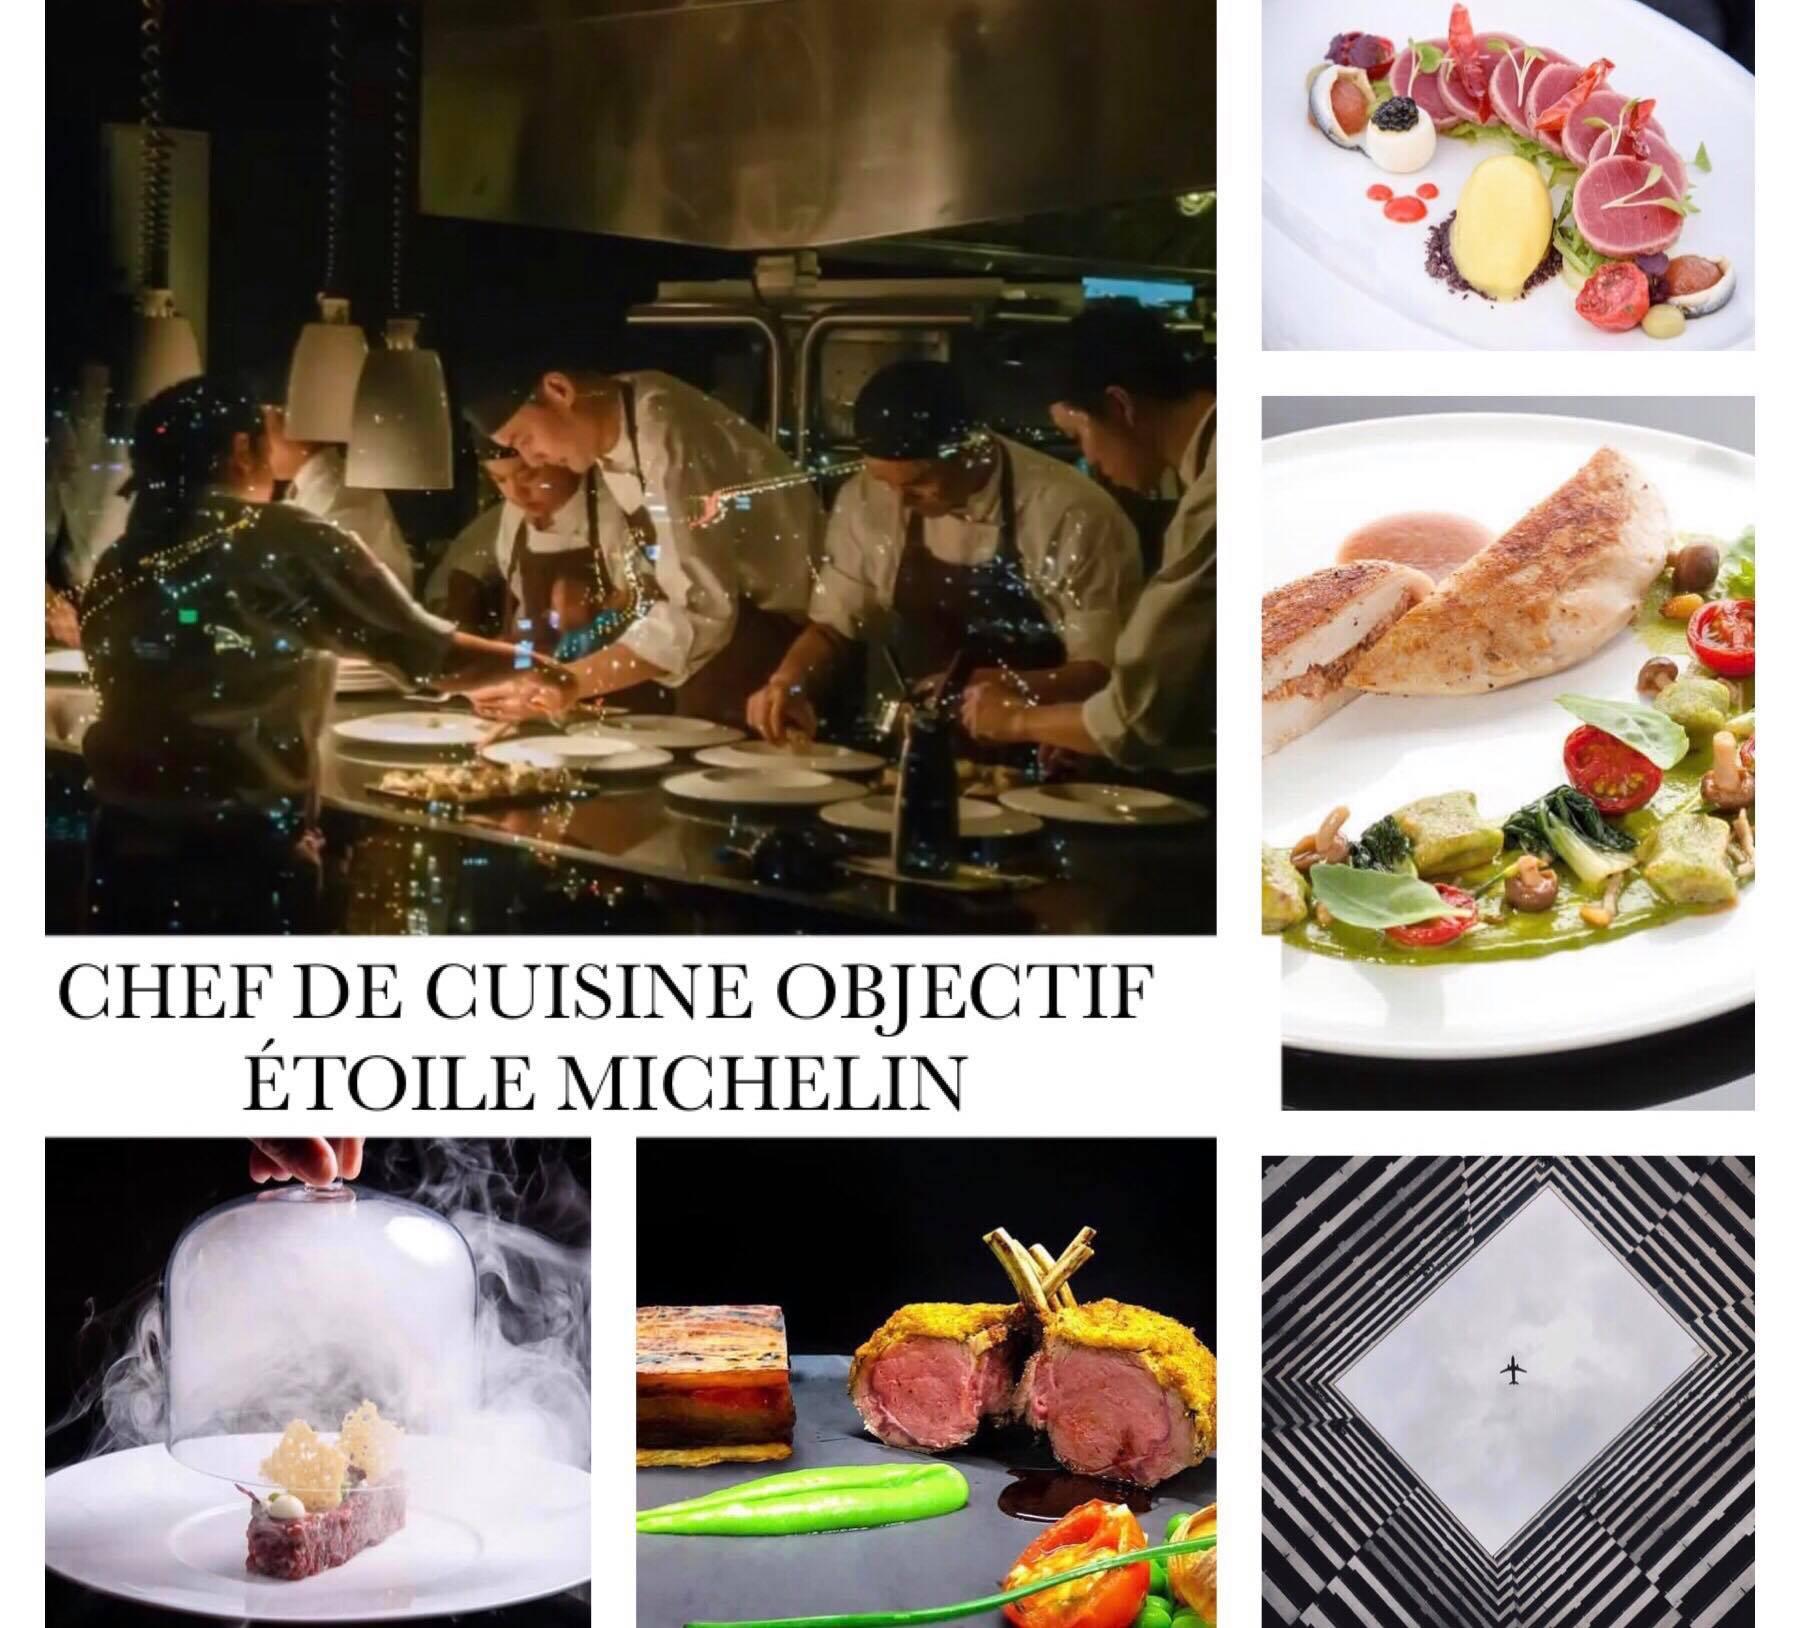 Chef de cuisine rhea recrutement - Cabinet recrutement hotellerie restauration ...